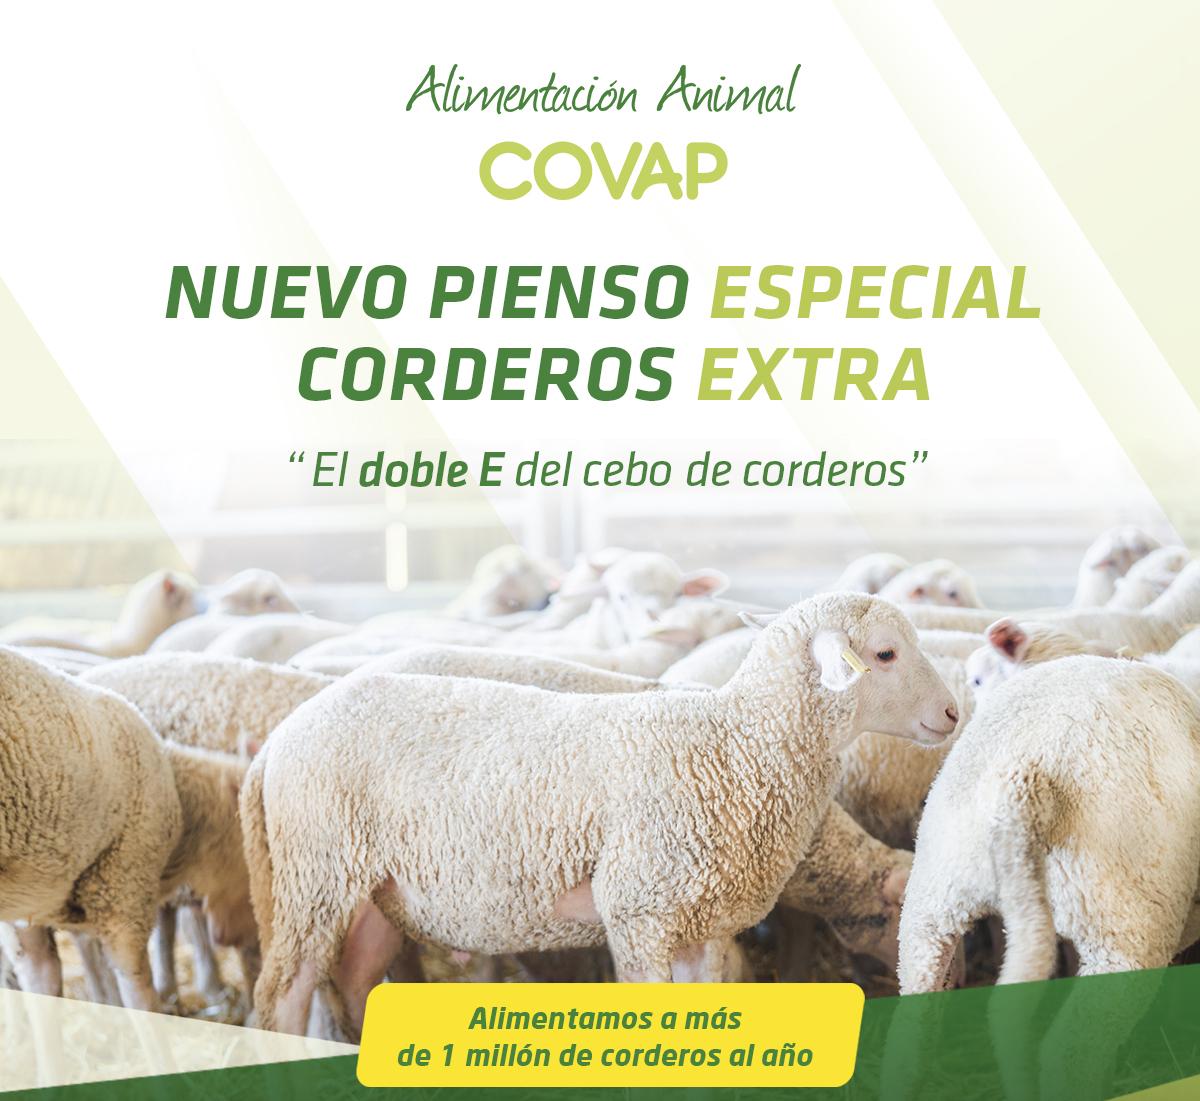 Doble E del cebo de corderos | COVAP